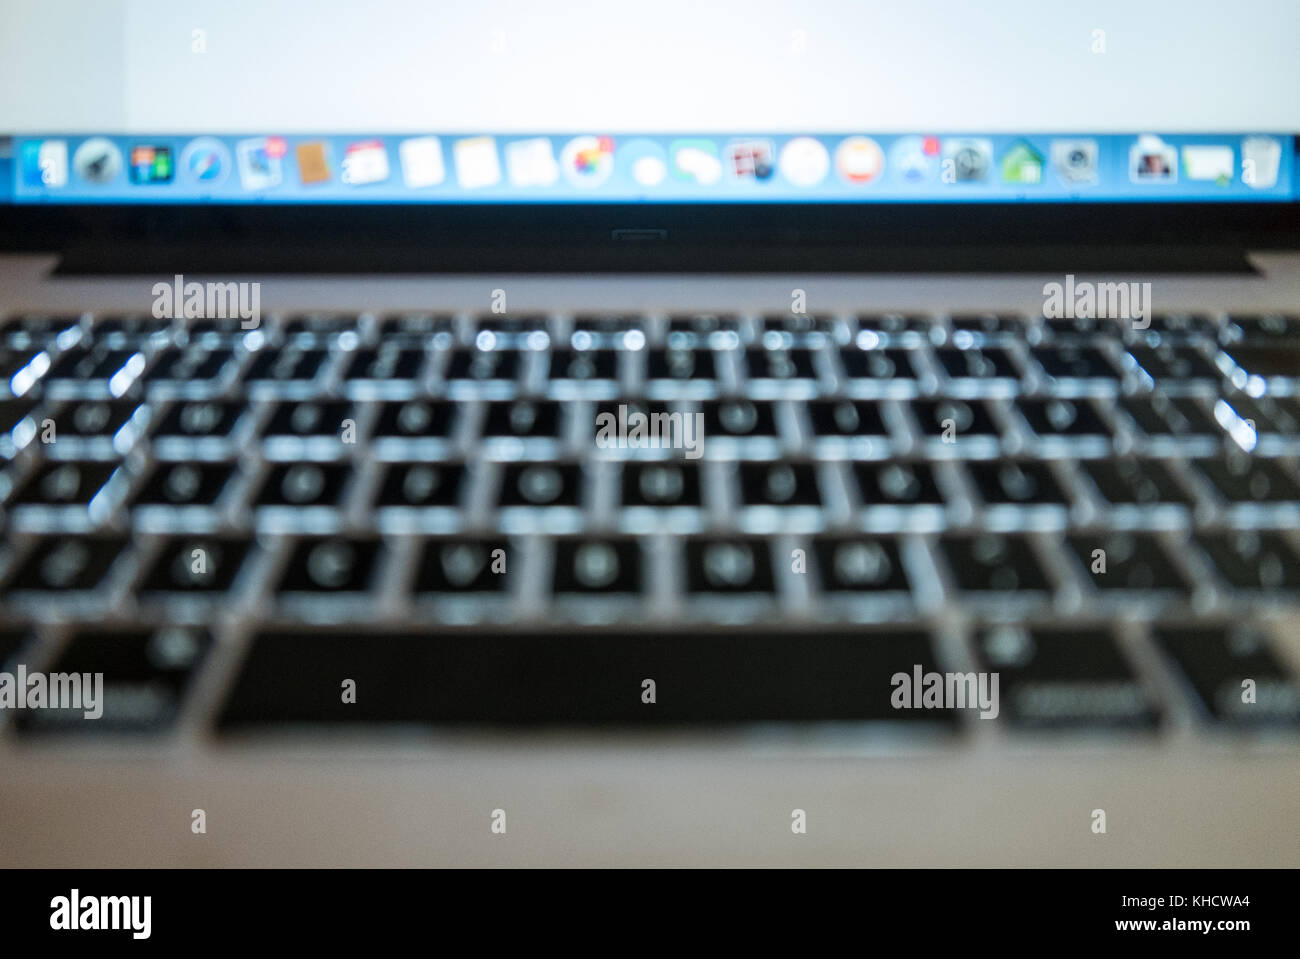 Mac pro laptop keyboard and screen shot slightly out of focus stock mac pro laptop keyboard and screen shot slightly out of focus ccuart Gallery